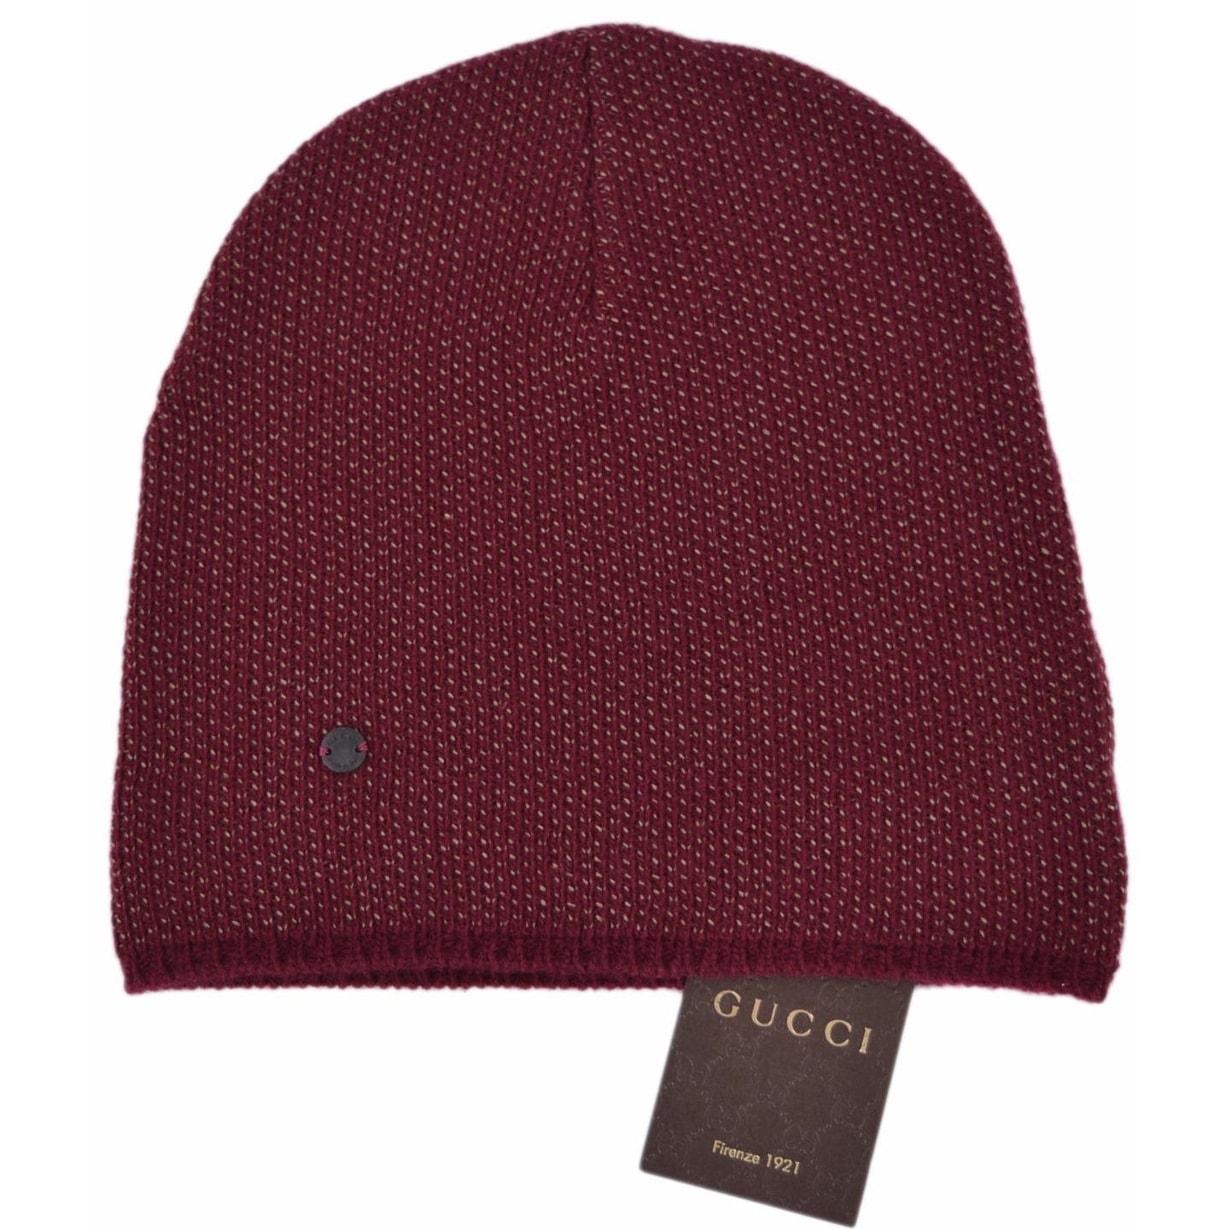 bd9da6bbcef Shop Gucci 352350 Men s Burgundy Beige Wool Cashmere Beanie Ski Winter Hat  XL - Extra Large - Free Shipping Today - Overstock - 12037013